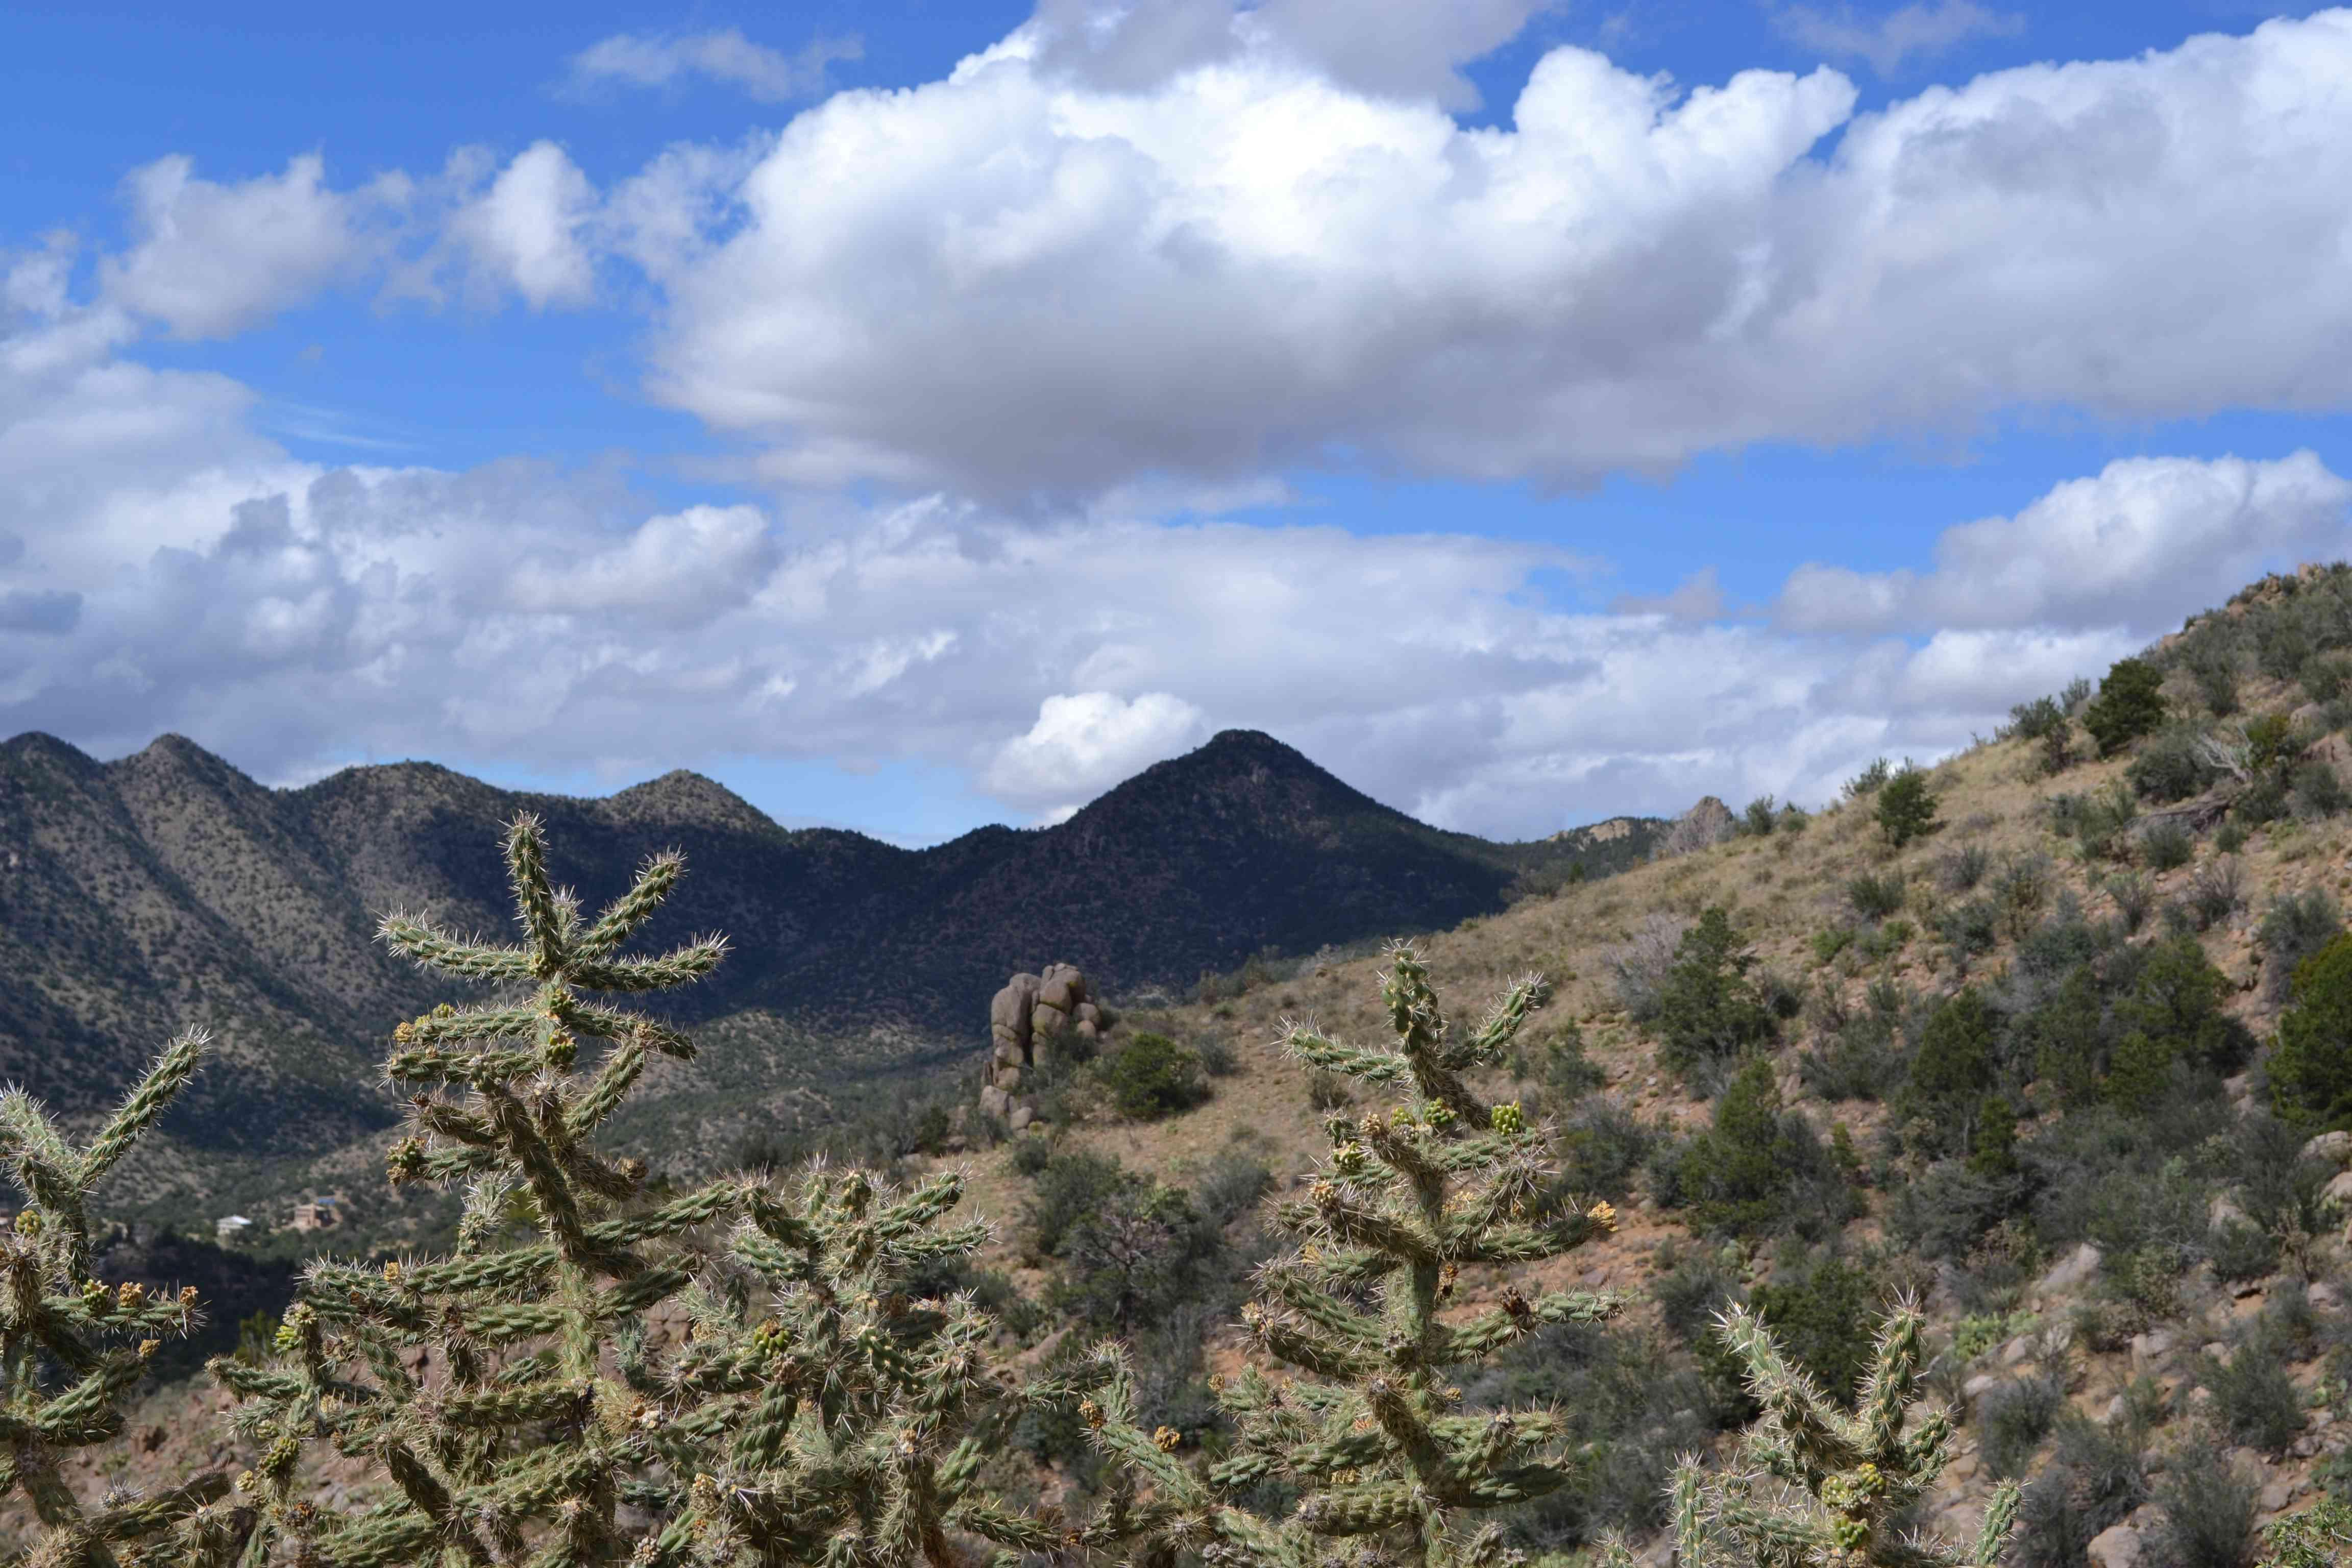 Base of the La Luz Trail in the Sandia Mountains